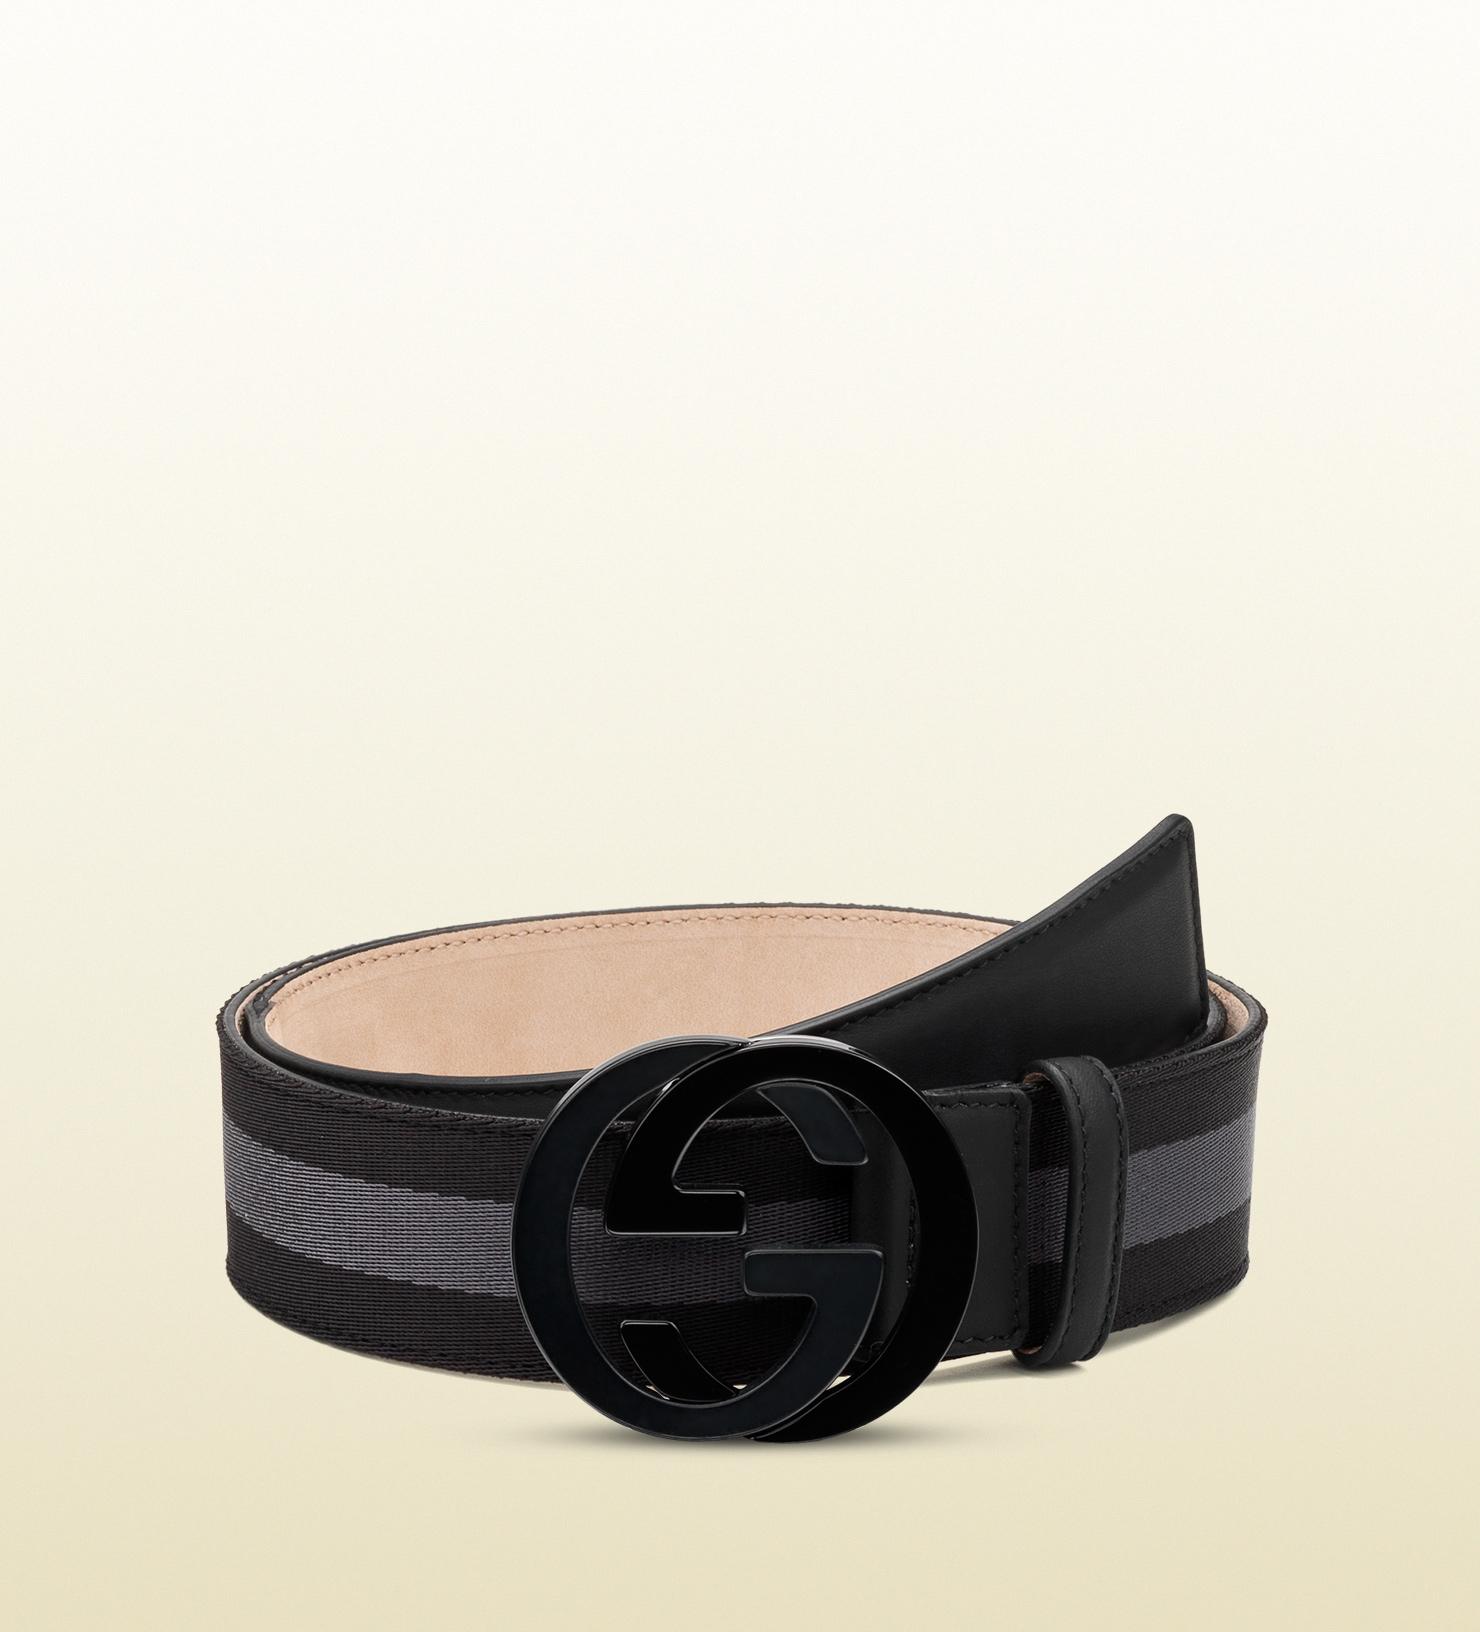 lyst gucci belt with interlocking g buckle in black for men